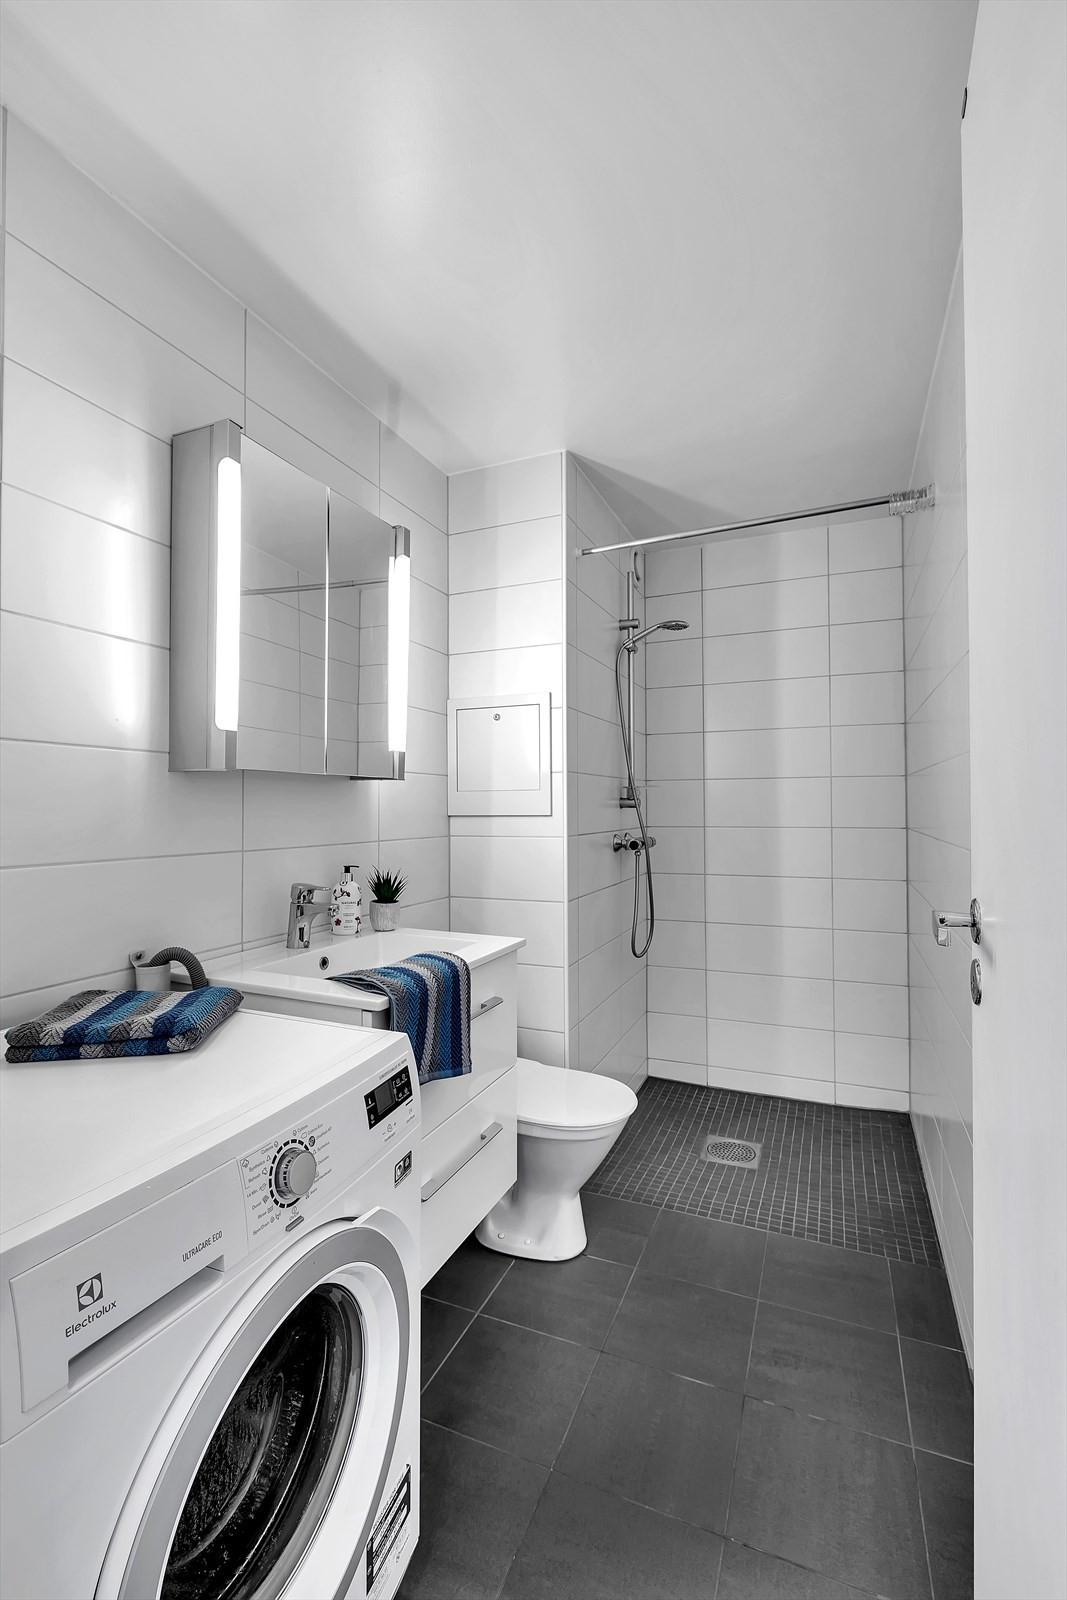 Flislagt badrom med moderne uttrykk og nøytrale farver.